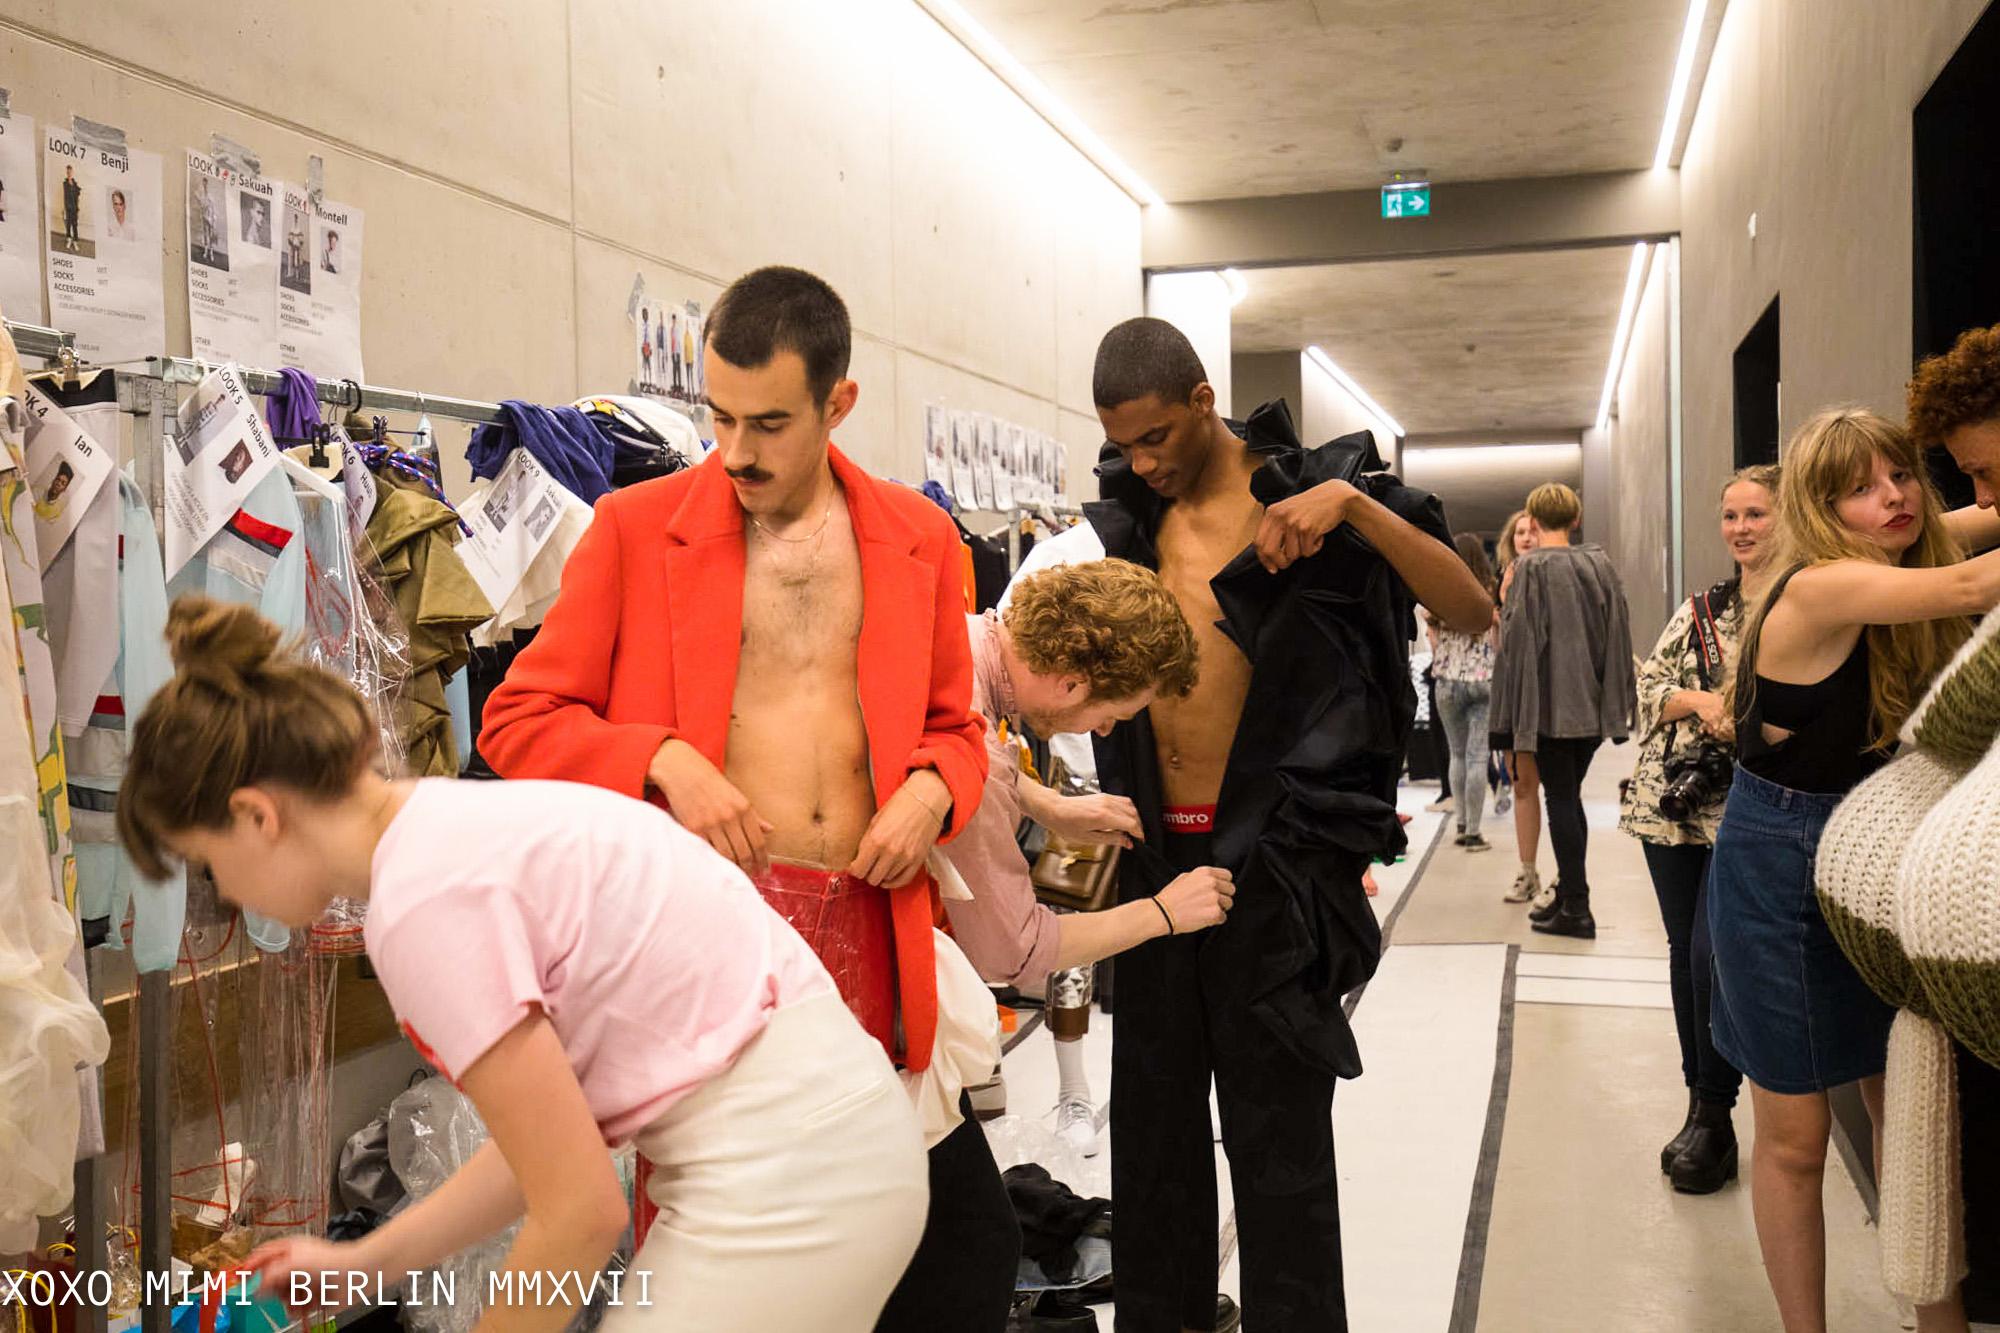 mimi berlin backstage